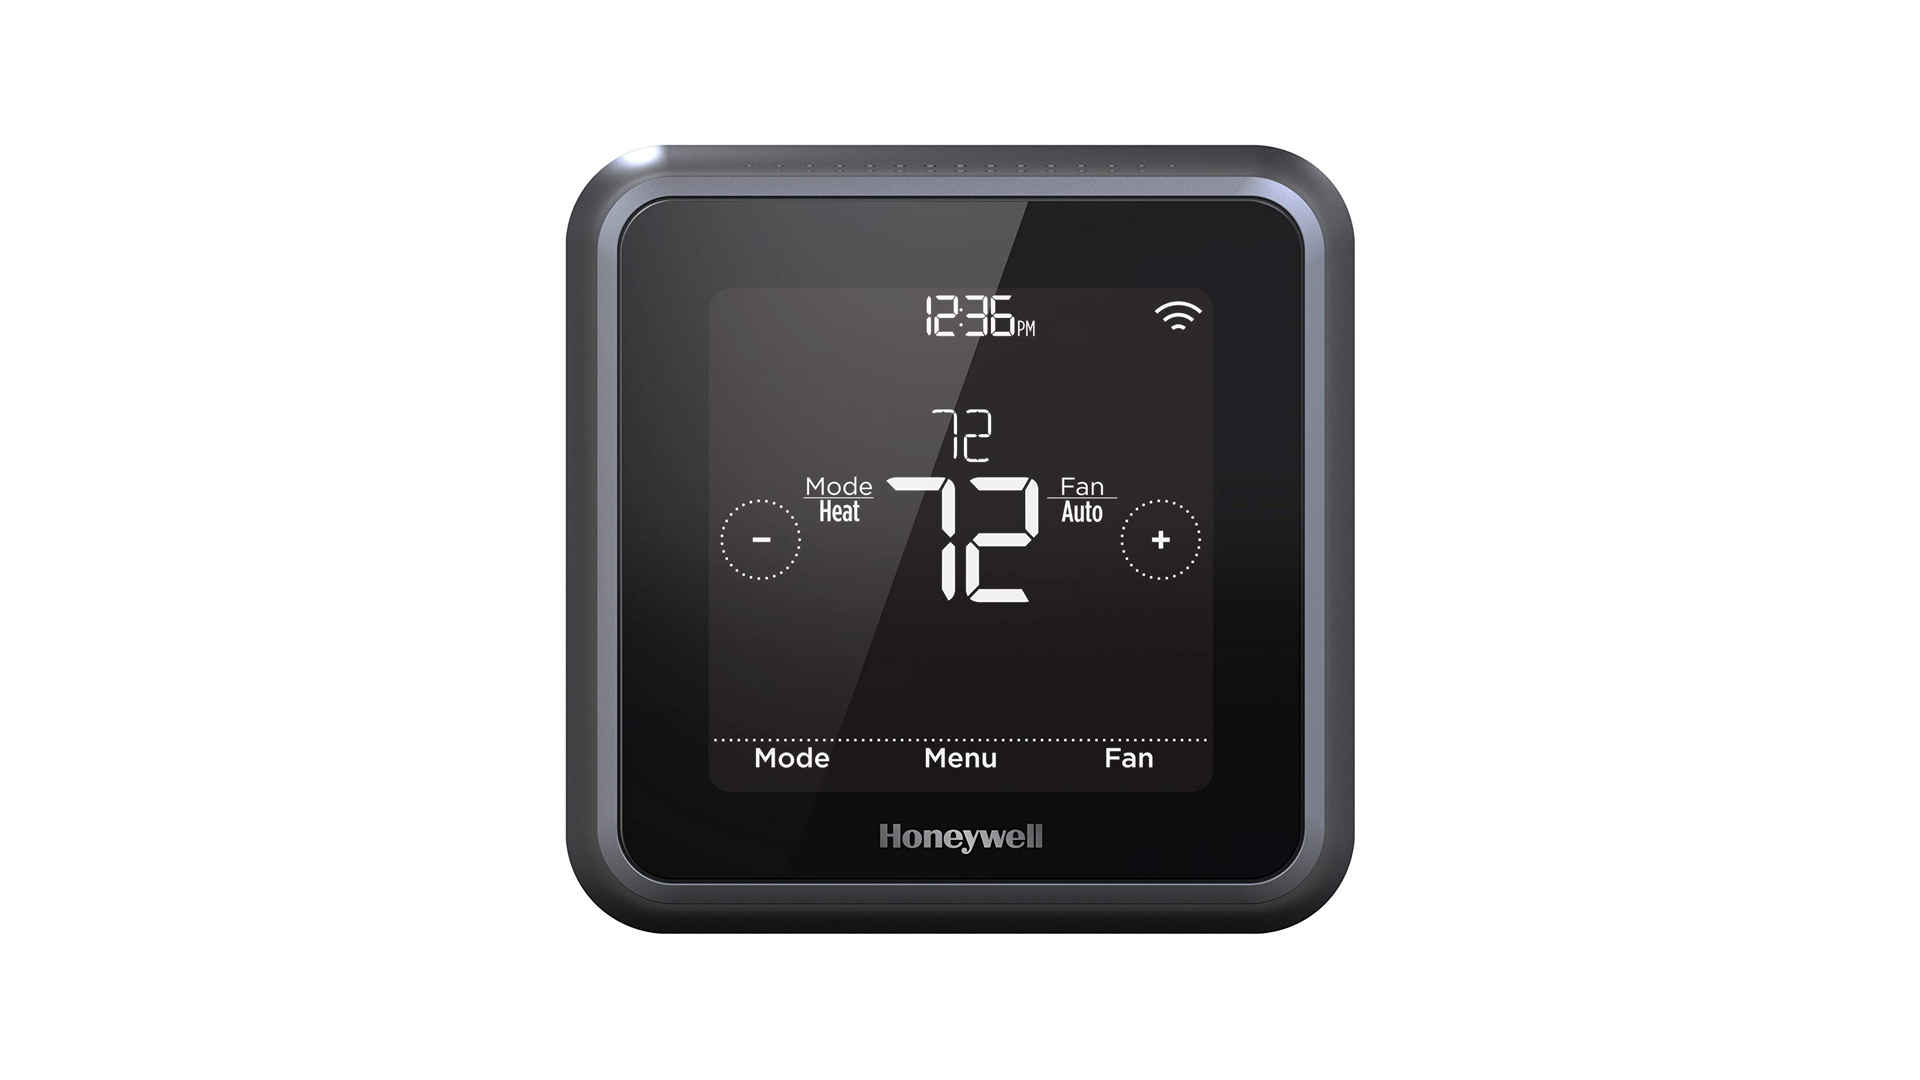 The Honeywell T5 Lyric Thermostat.